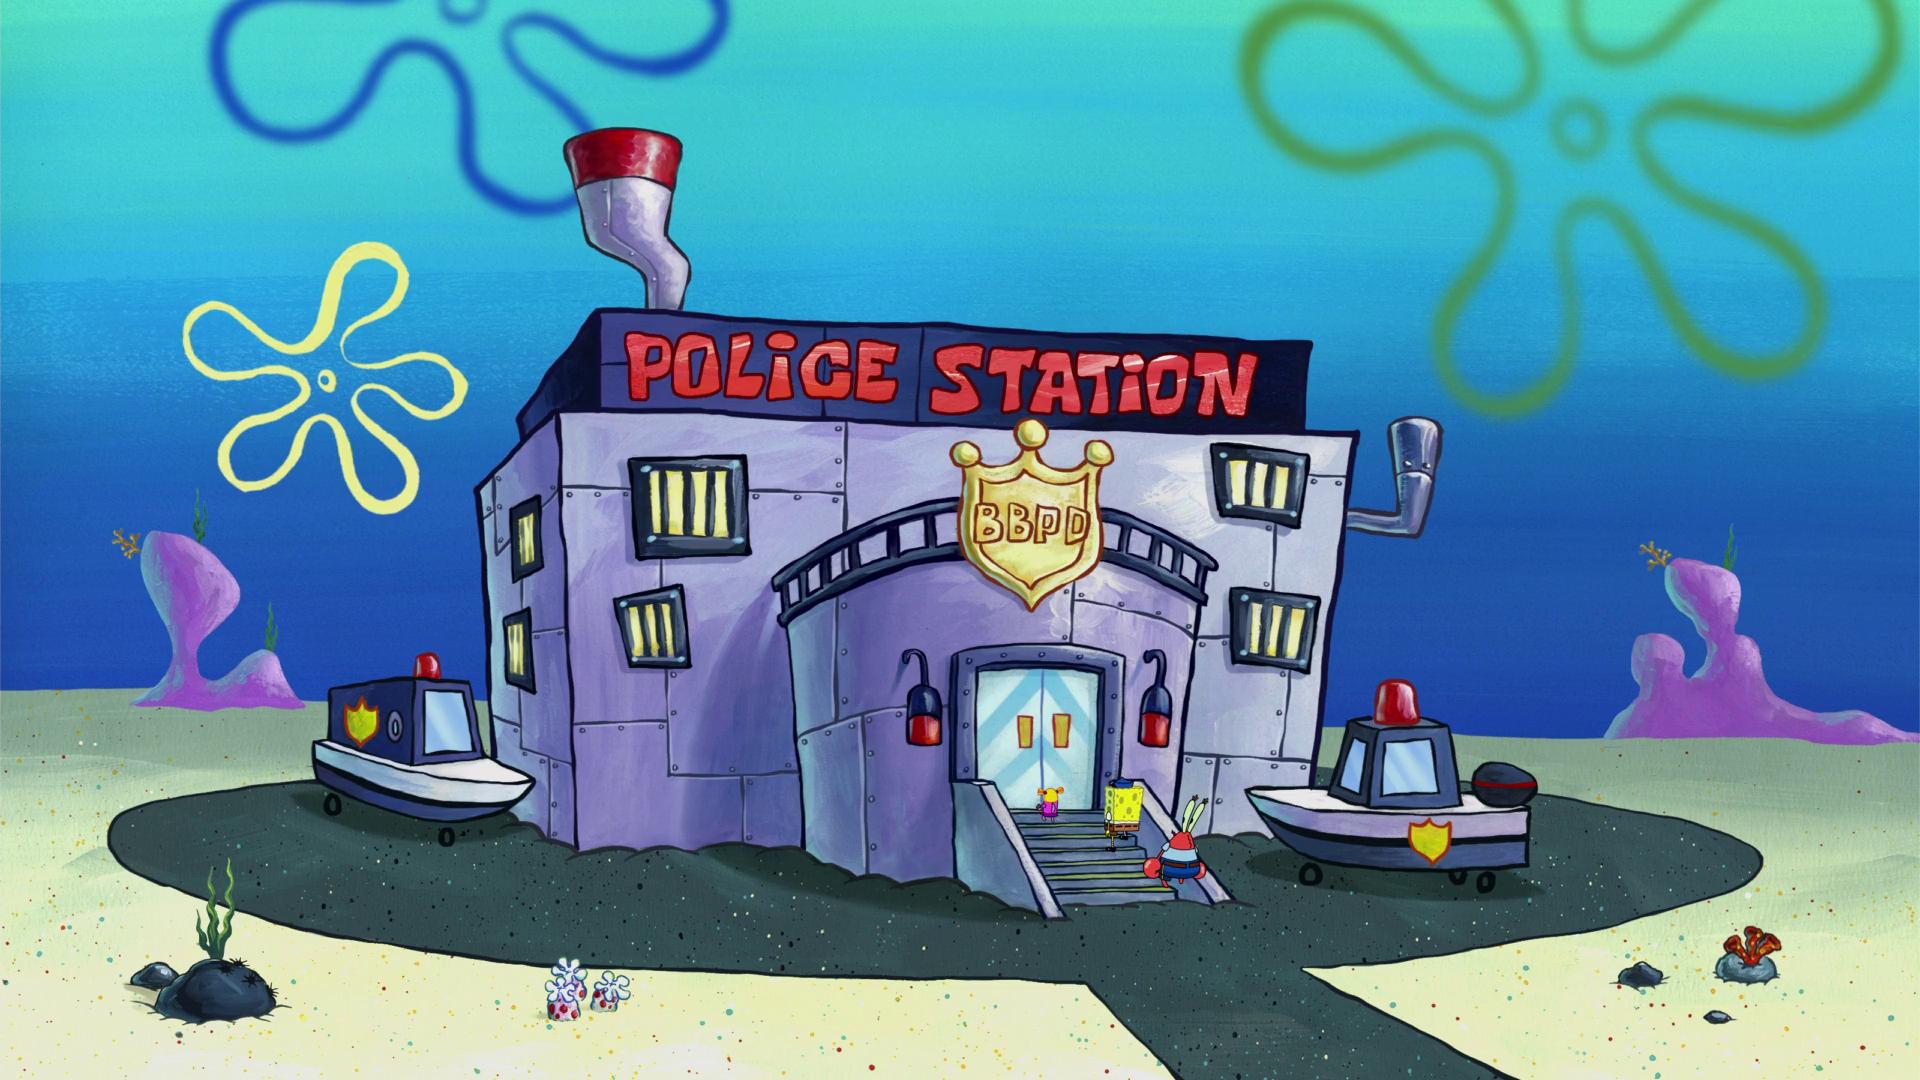 Bikini bottom police department